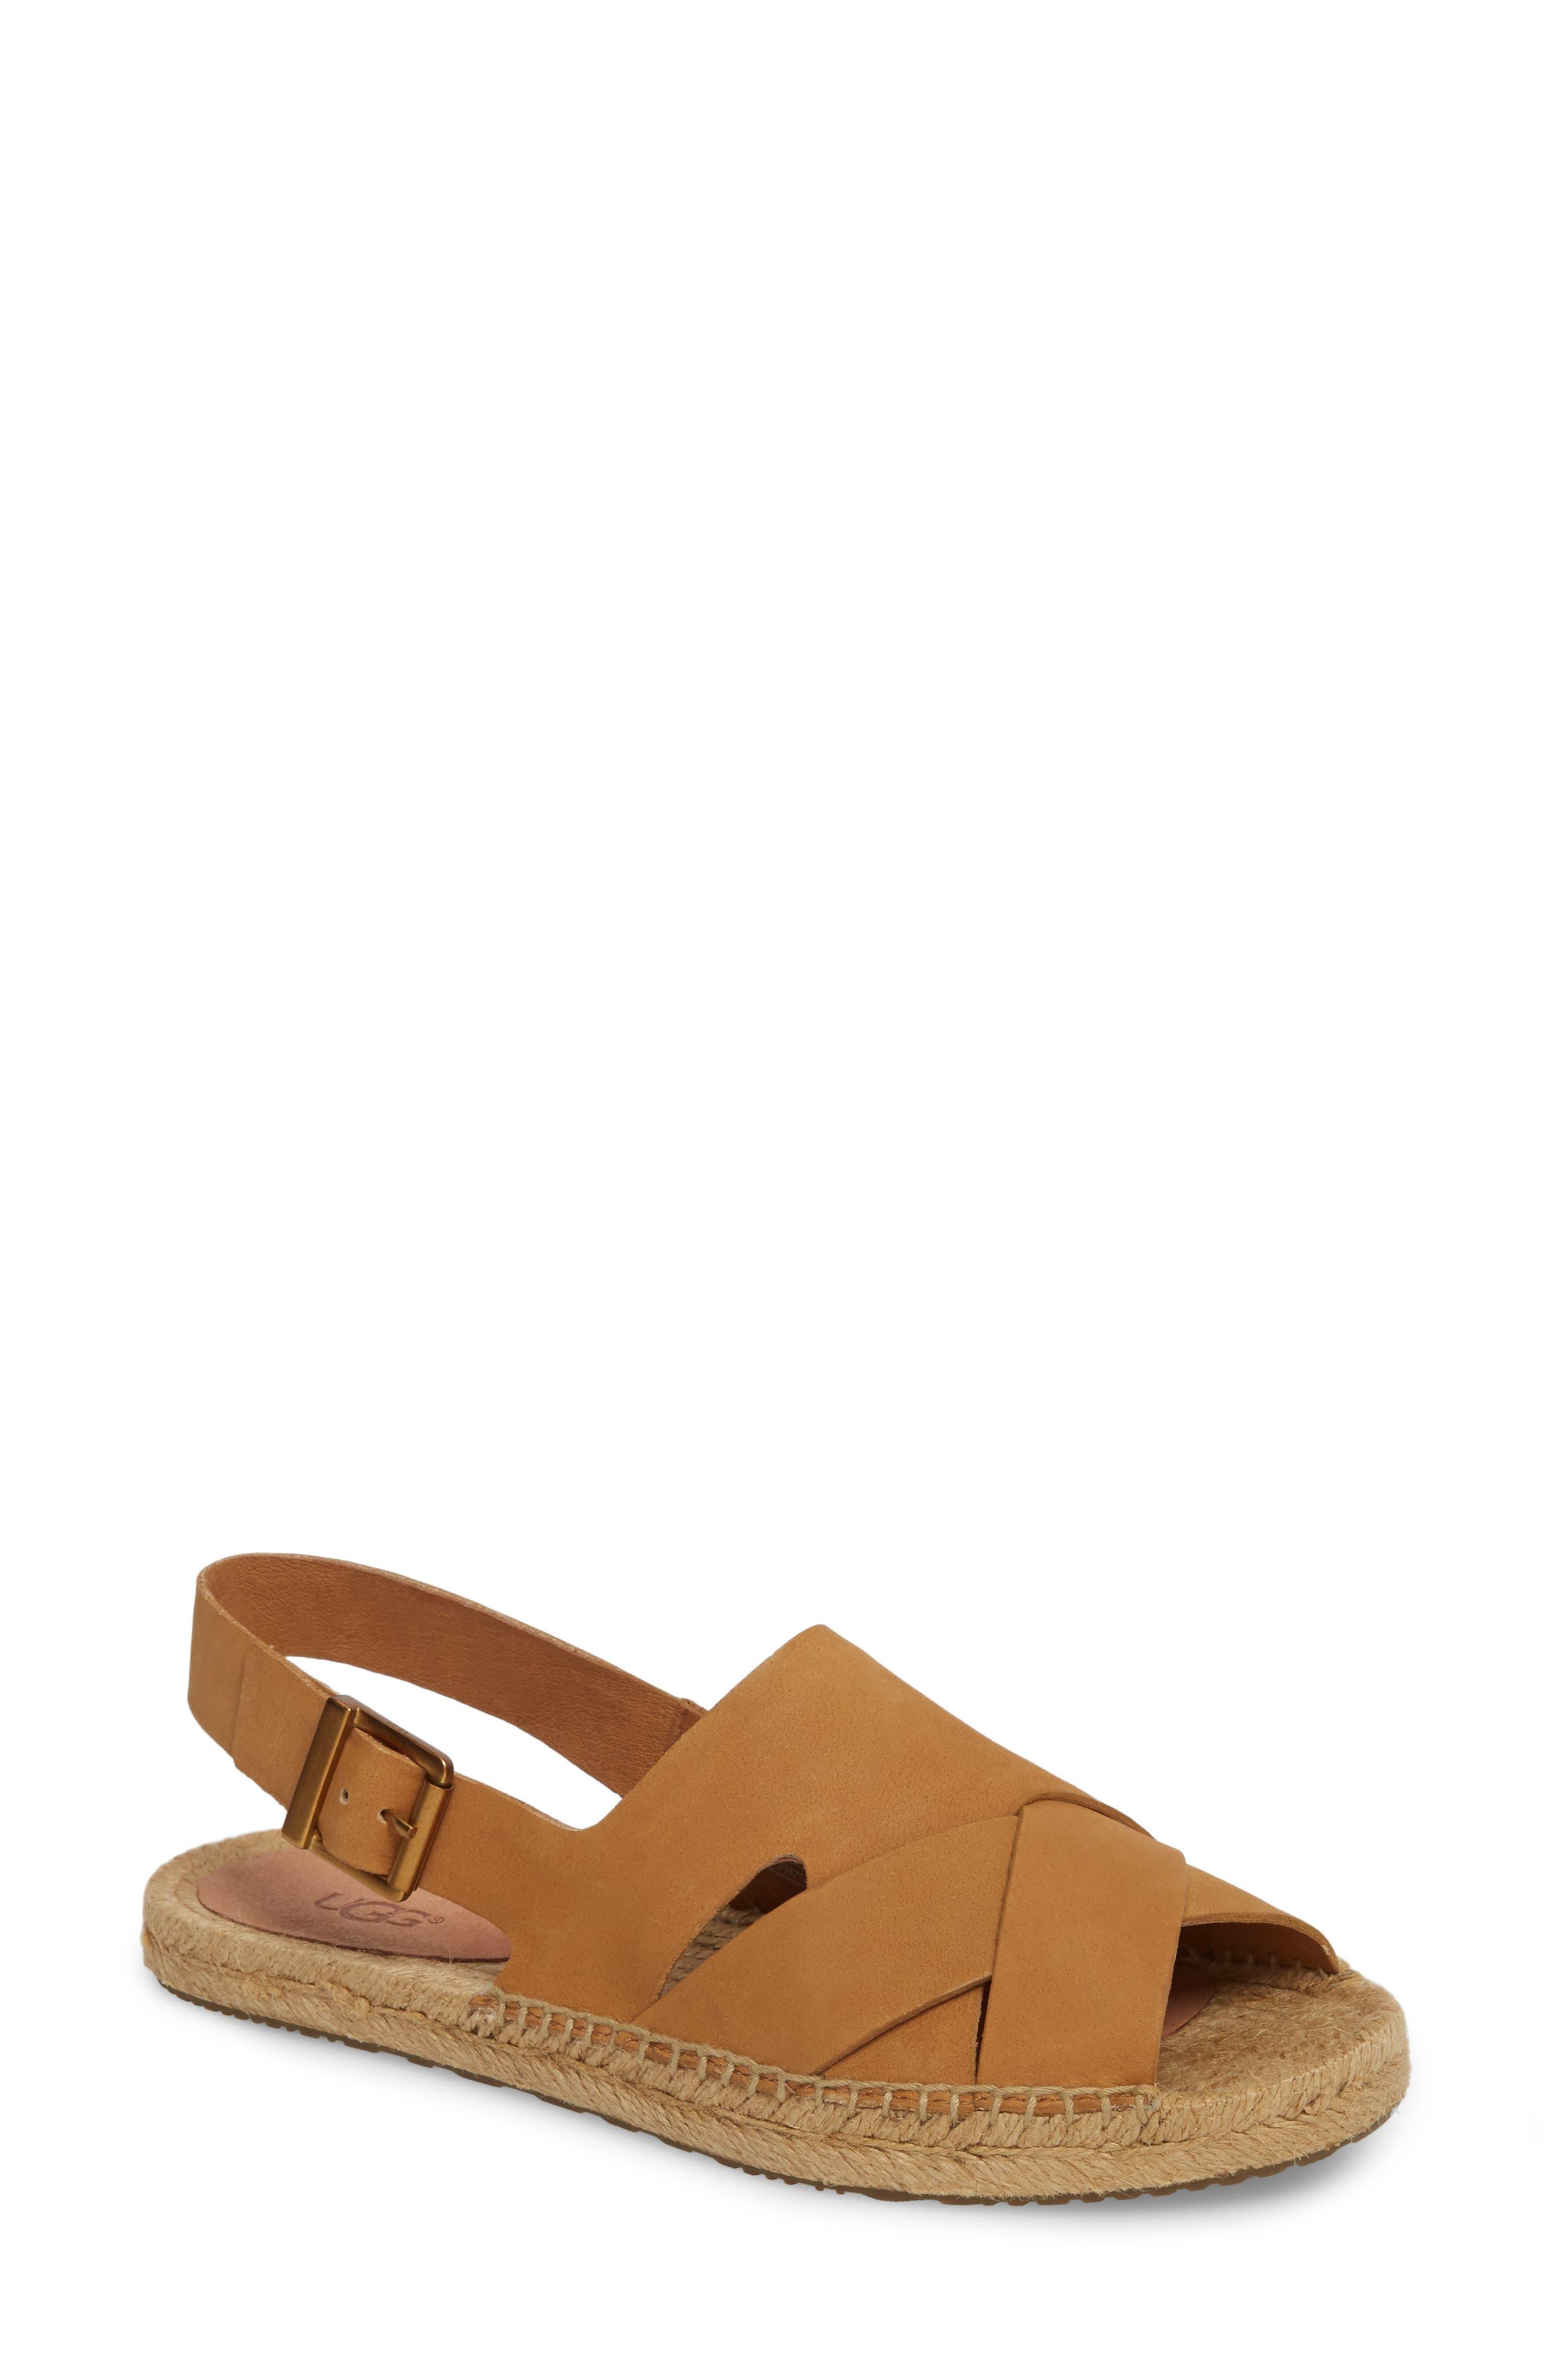 Marleah Sandal by Ugg®